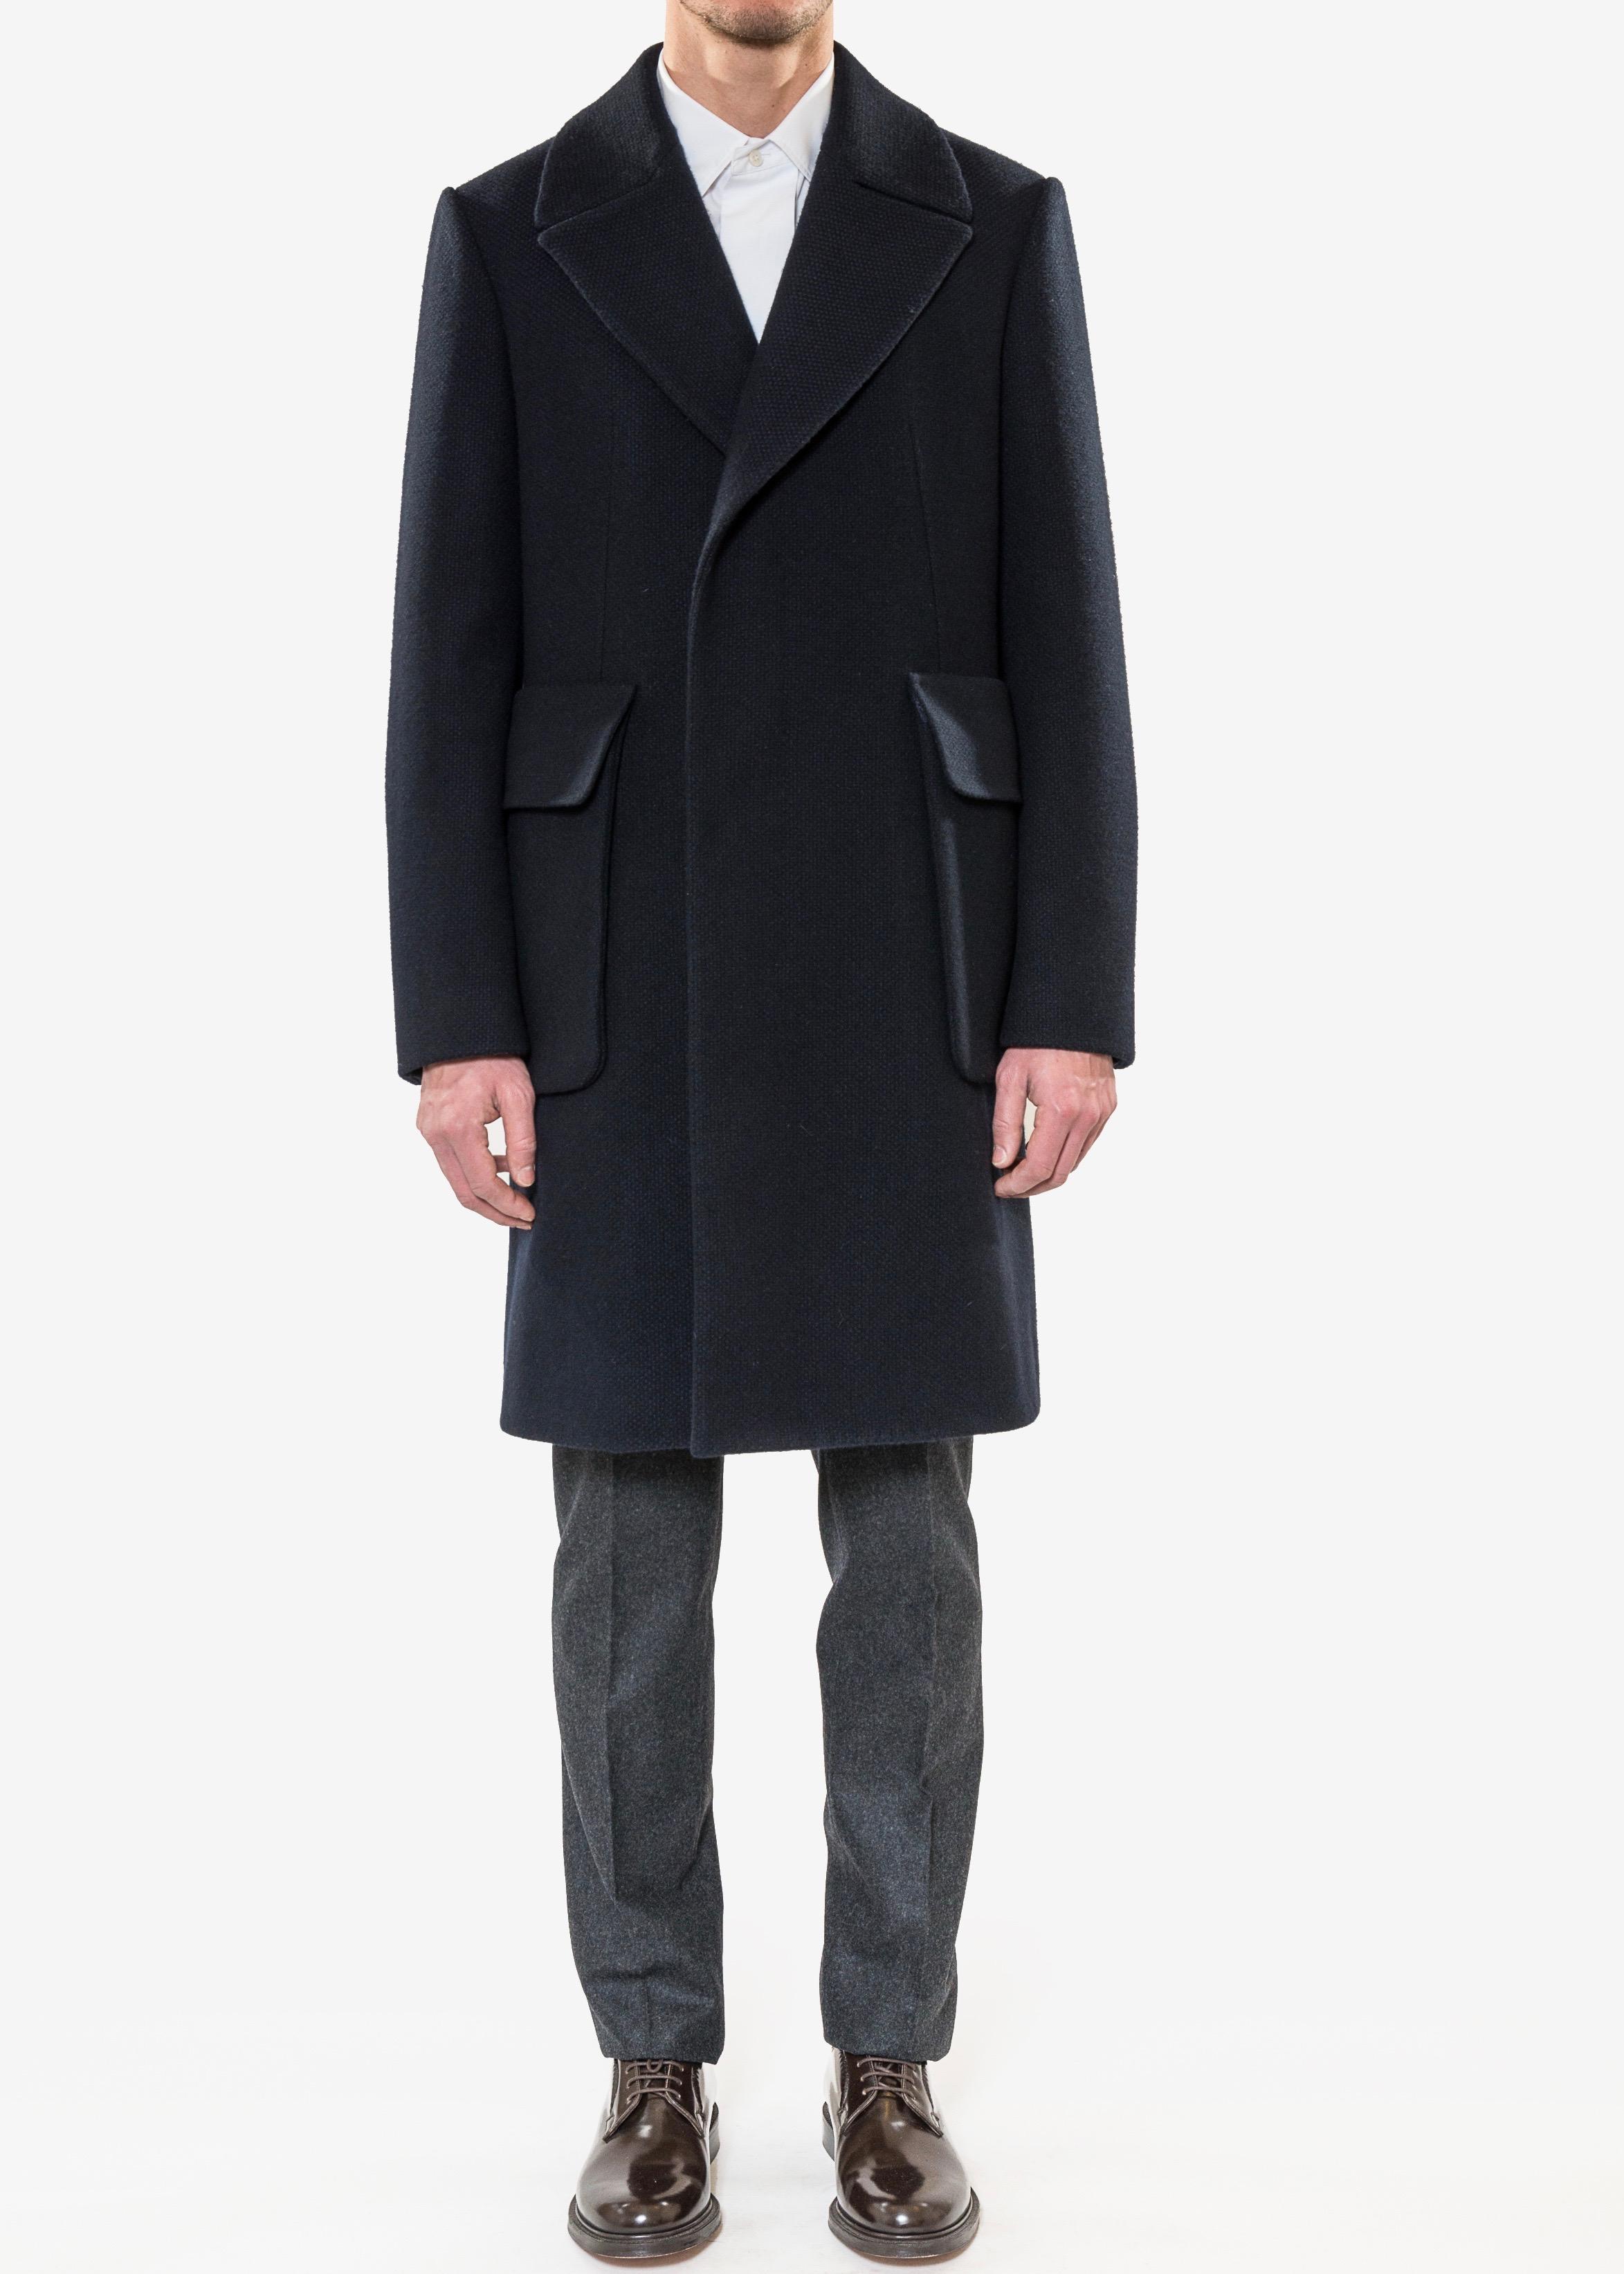 Mr Smith Paris AW18 - Coat